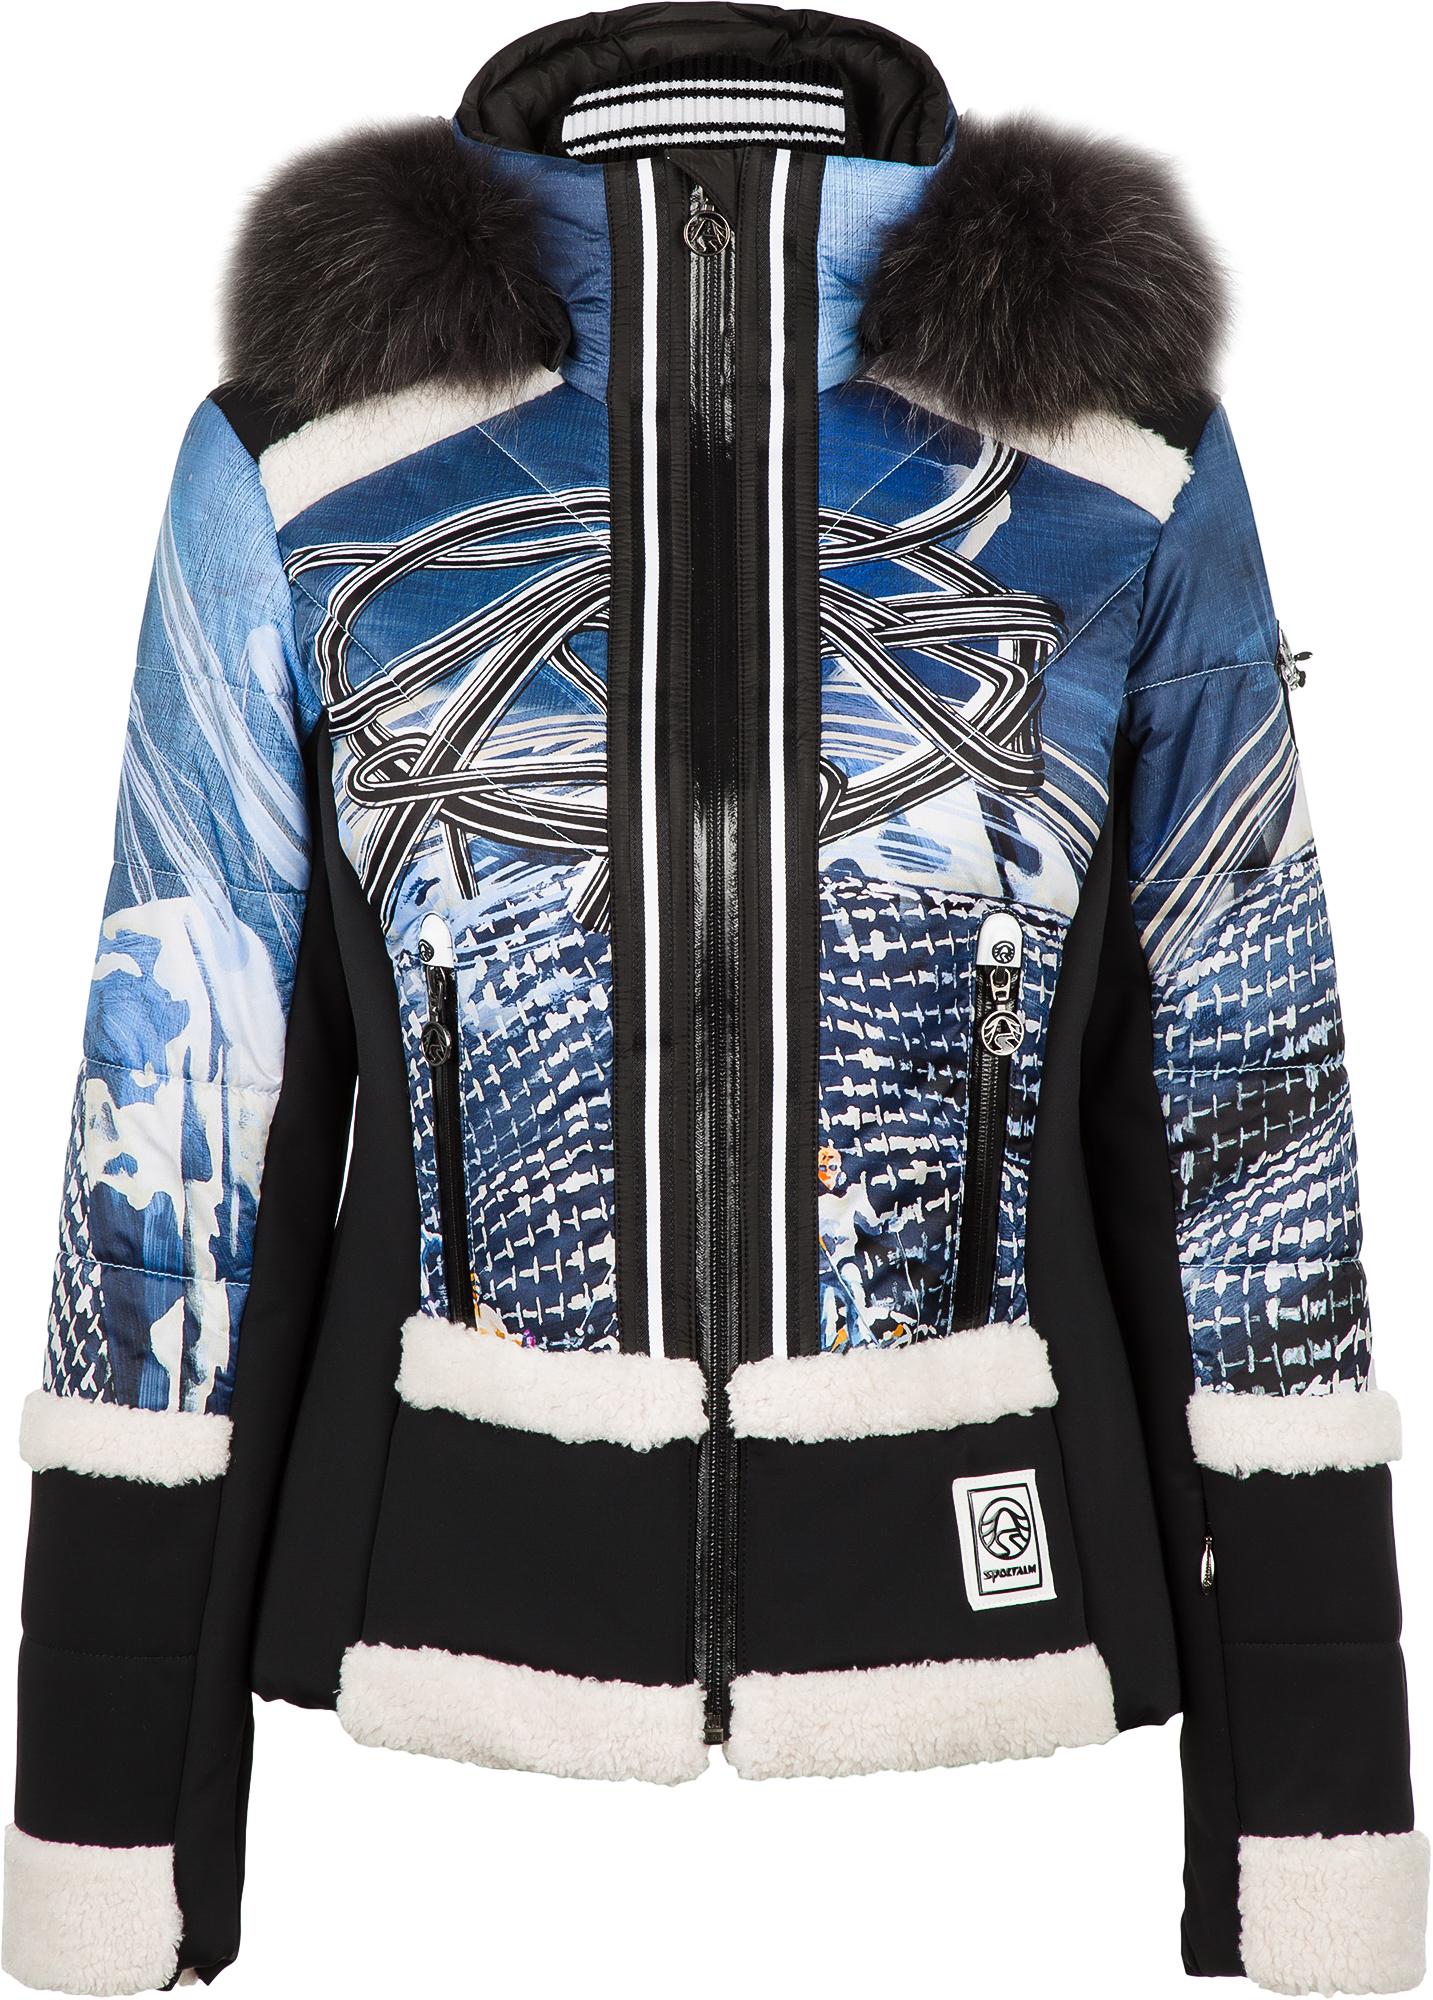 цена Sportalm Куртка утепленная женская Sportalm Lussa m.Kap+P, размер 44 онлайн в 2017 году